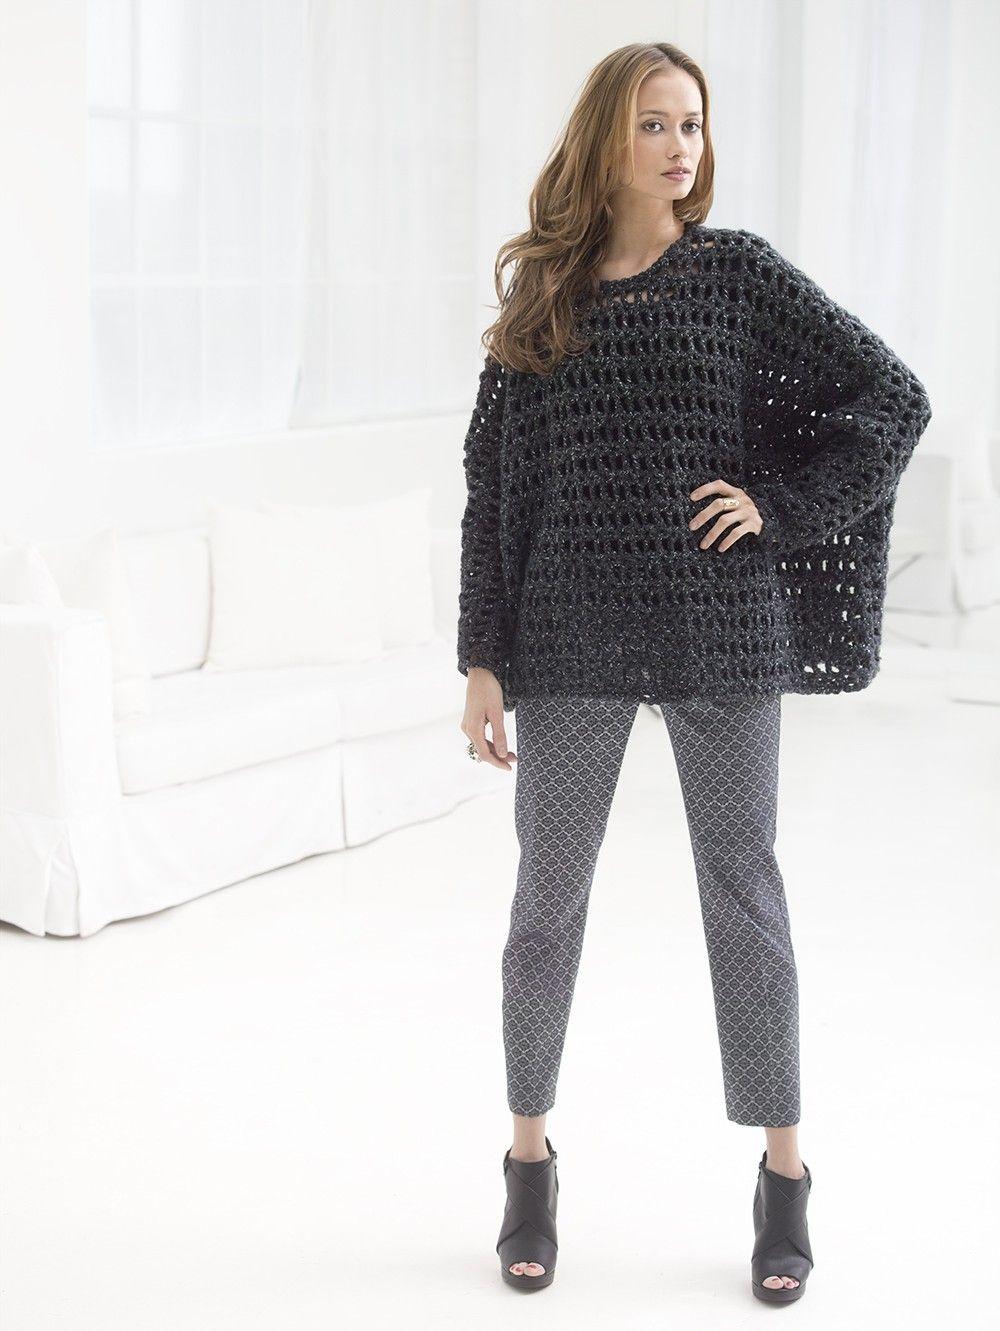 Popover Top (Crochet) | Sew and Stitch | Pinterest | Ponchos y Tejido